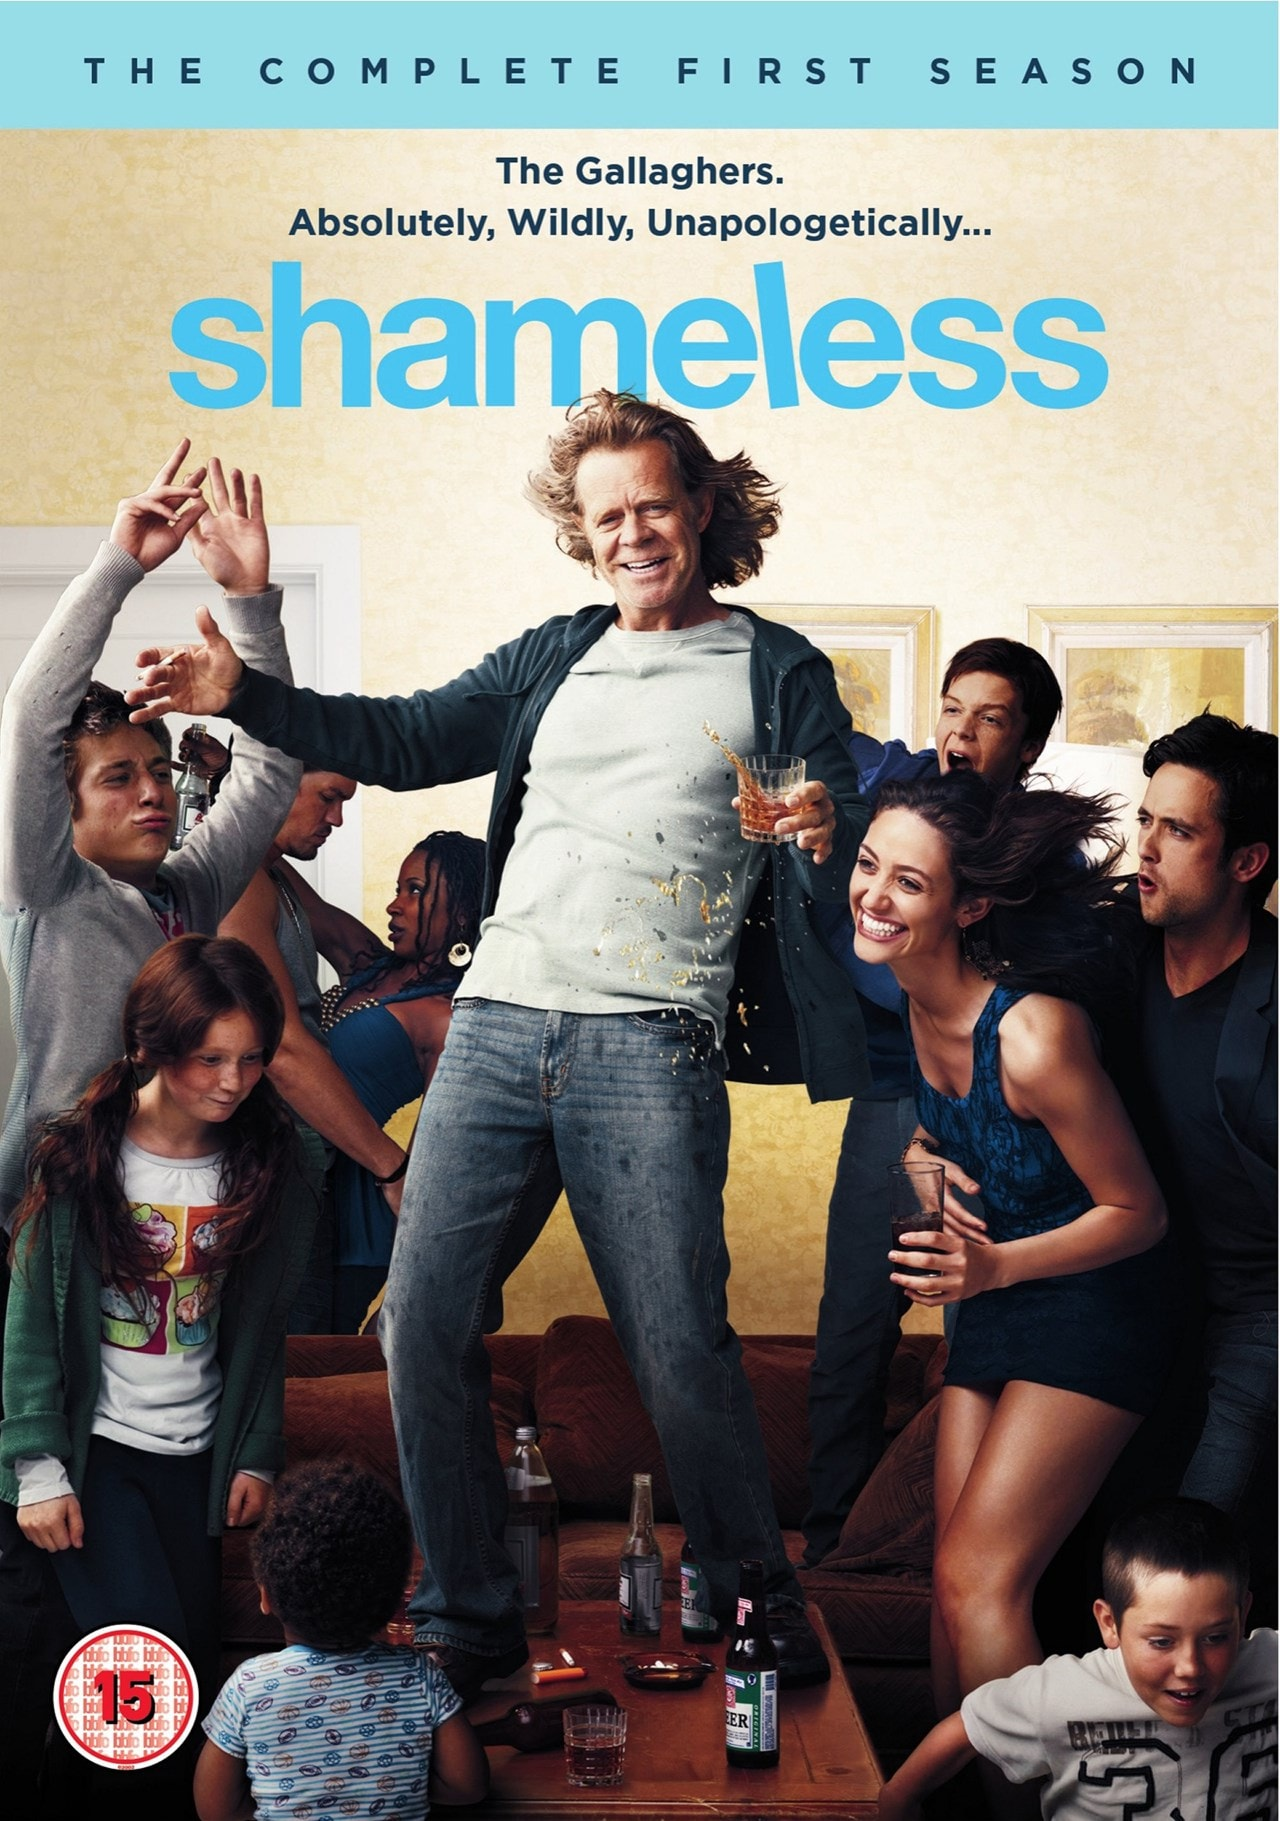 Shameless: The Complete First Season - 1